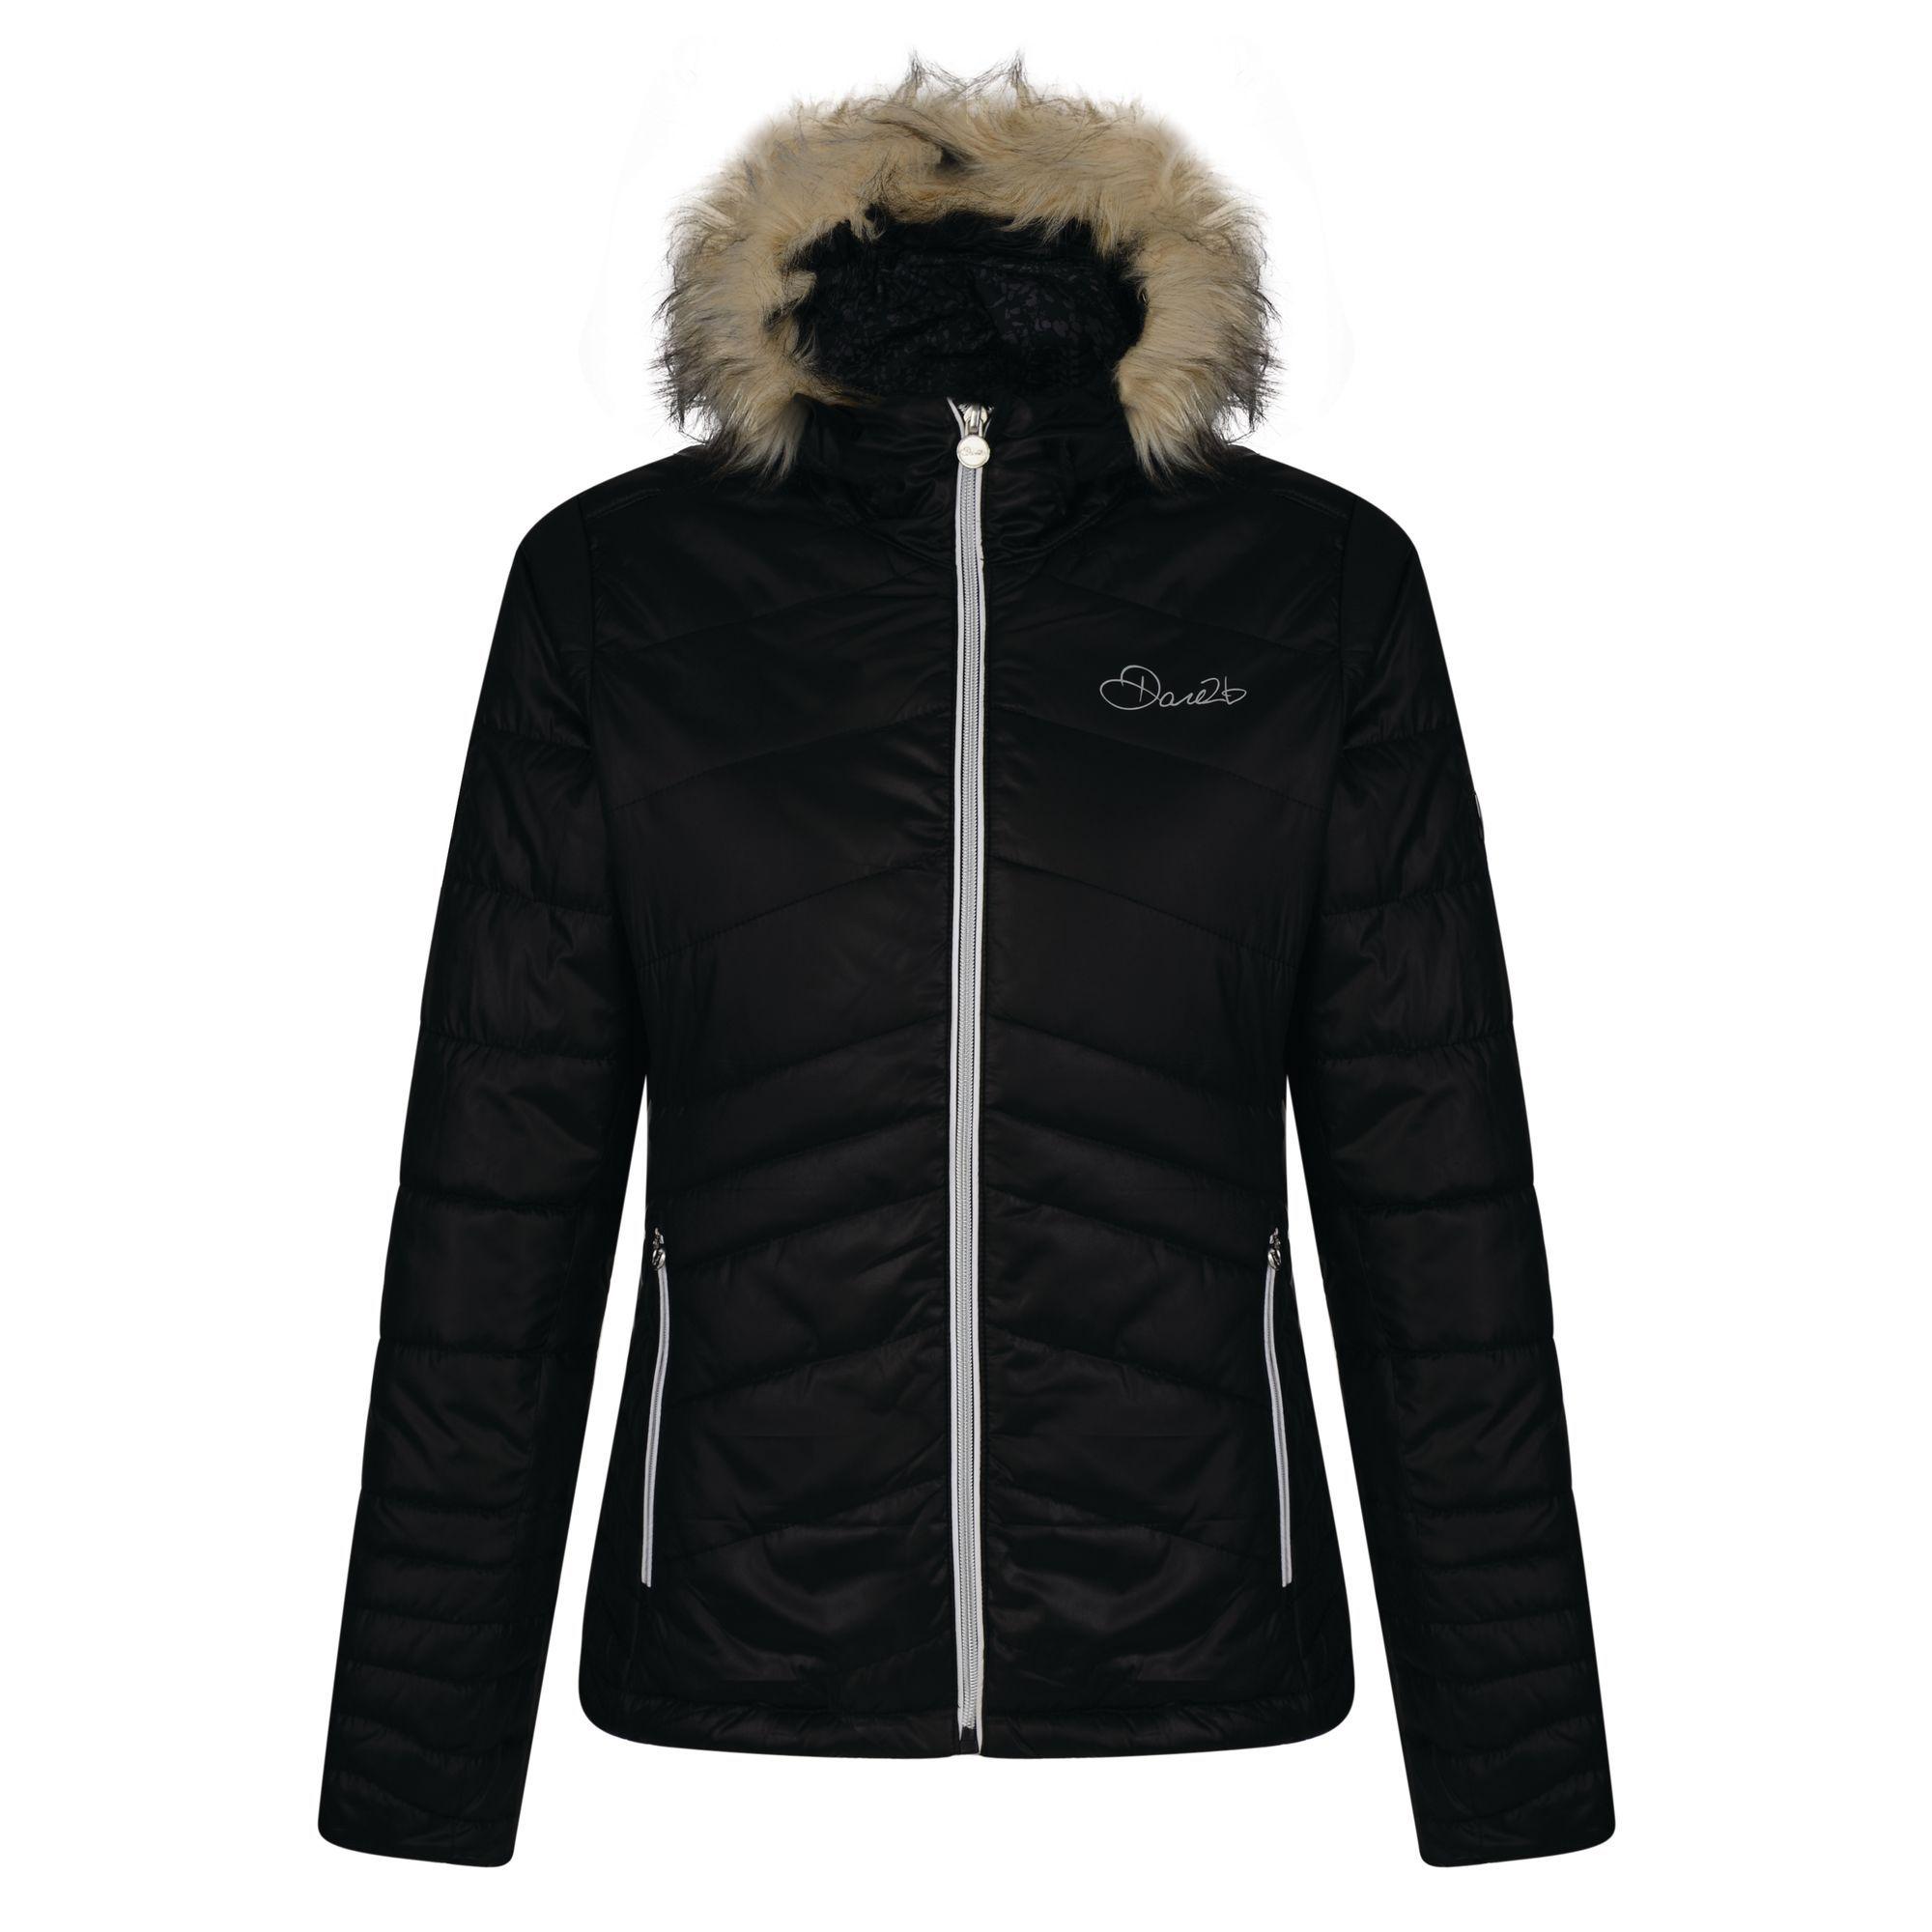 Dare 2b Womens/Ladies Comprise Luxe Ski Jacket (Black)